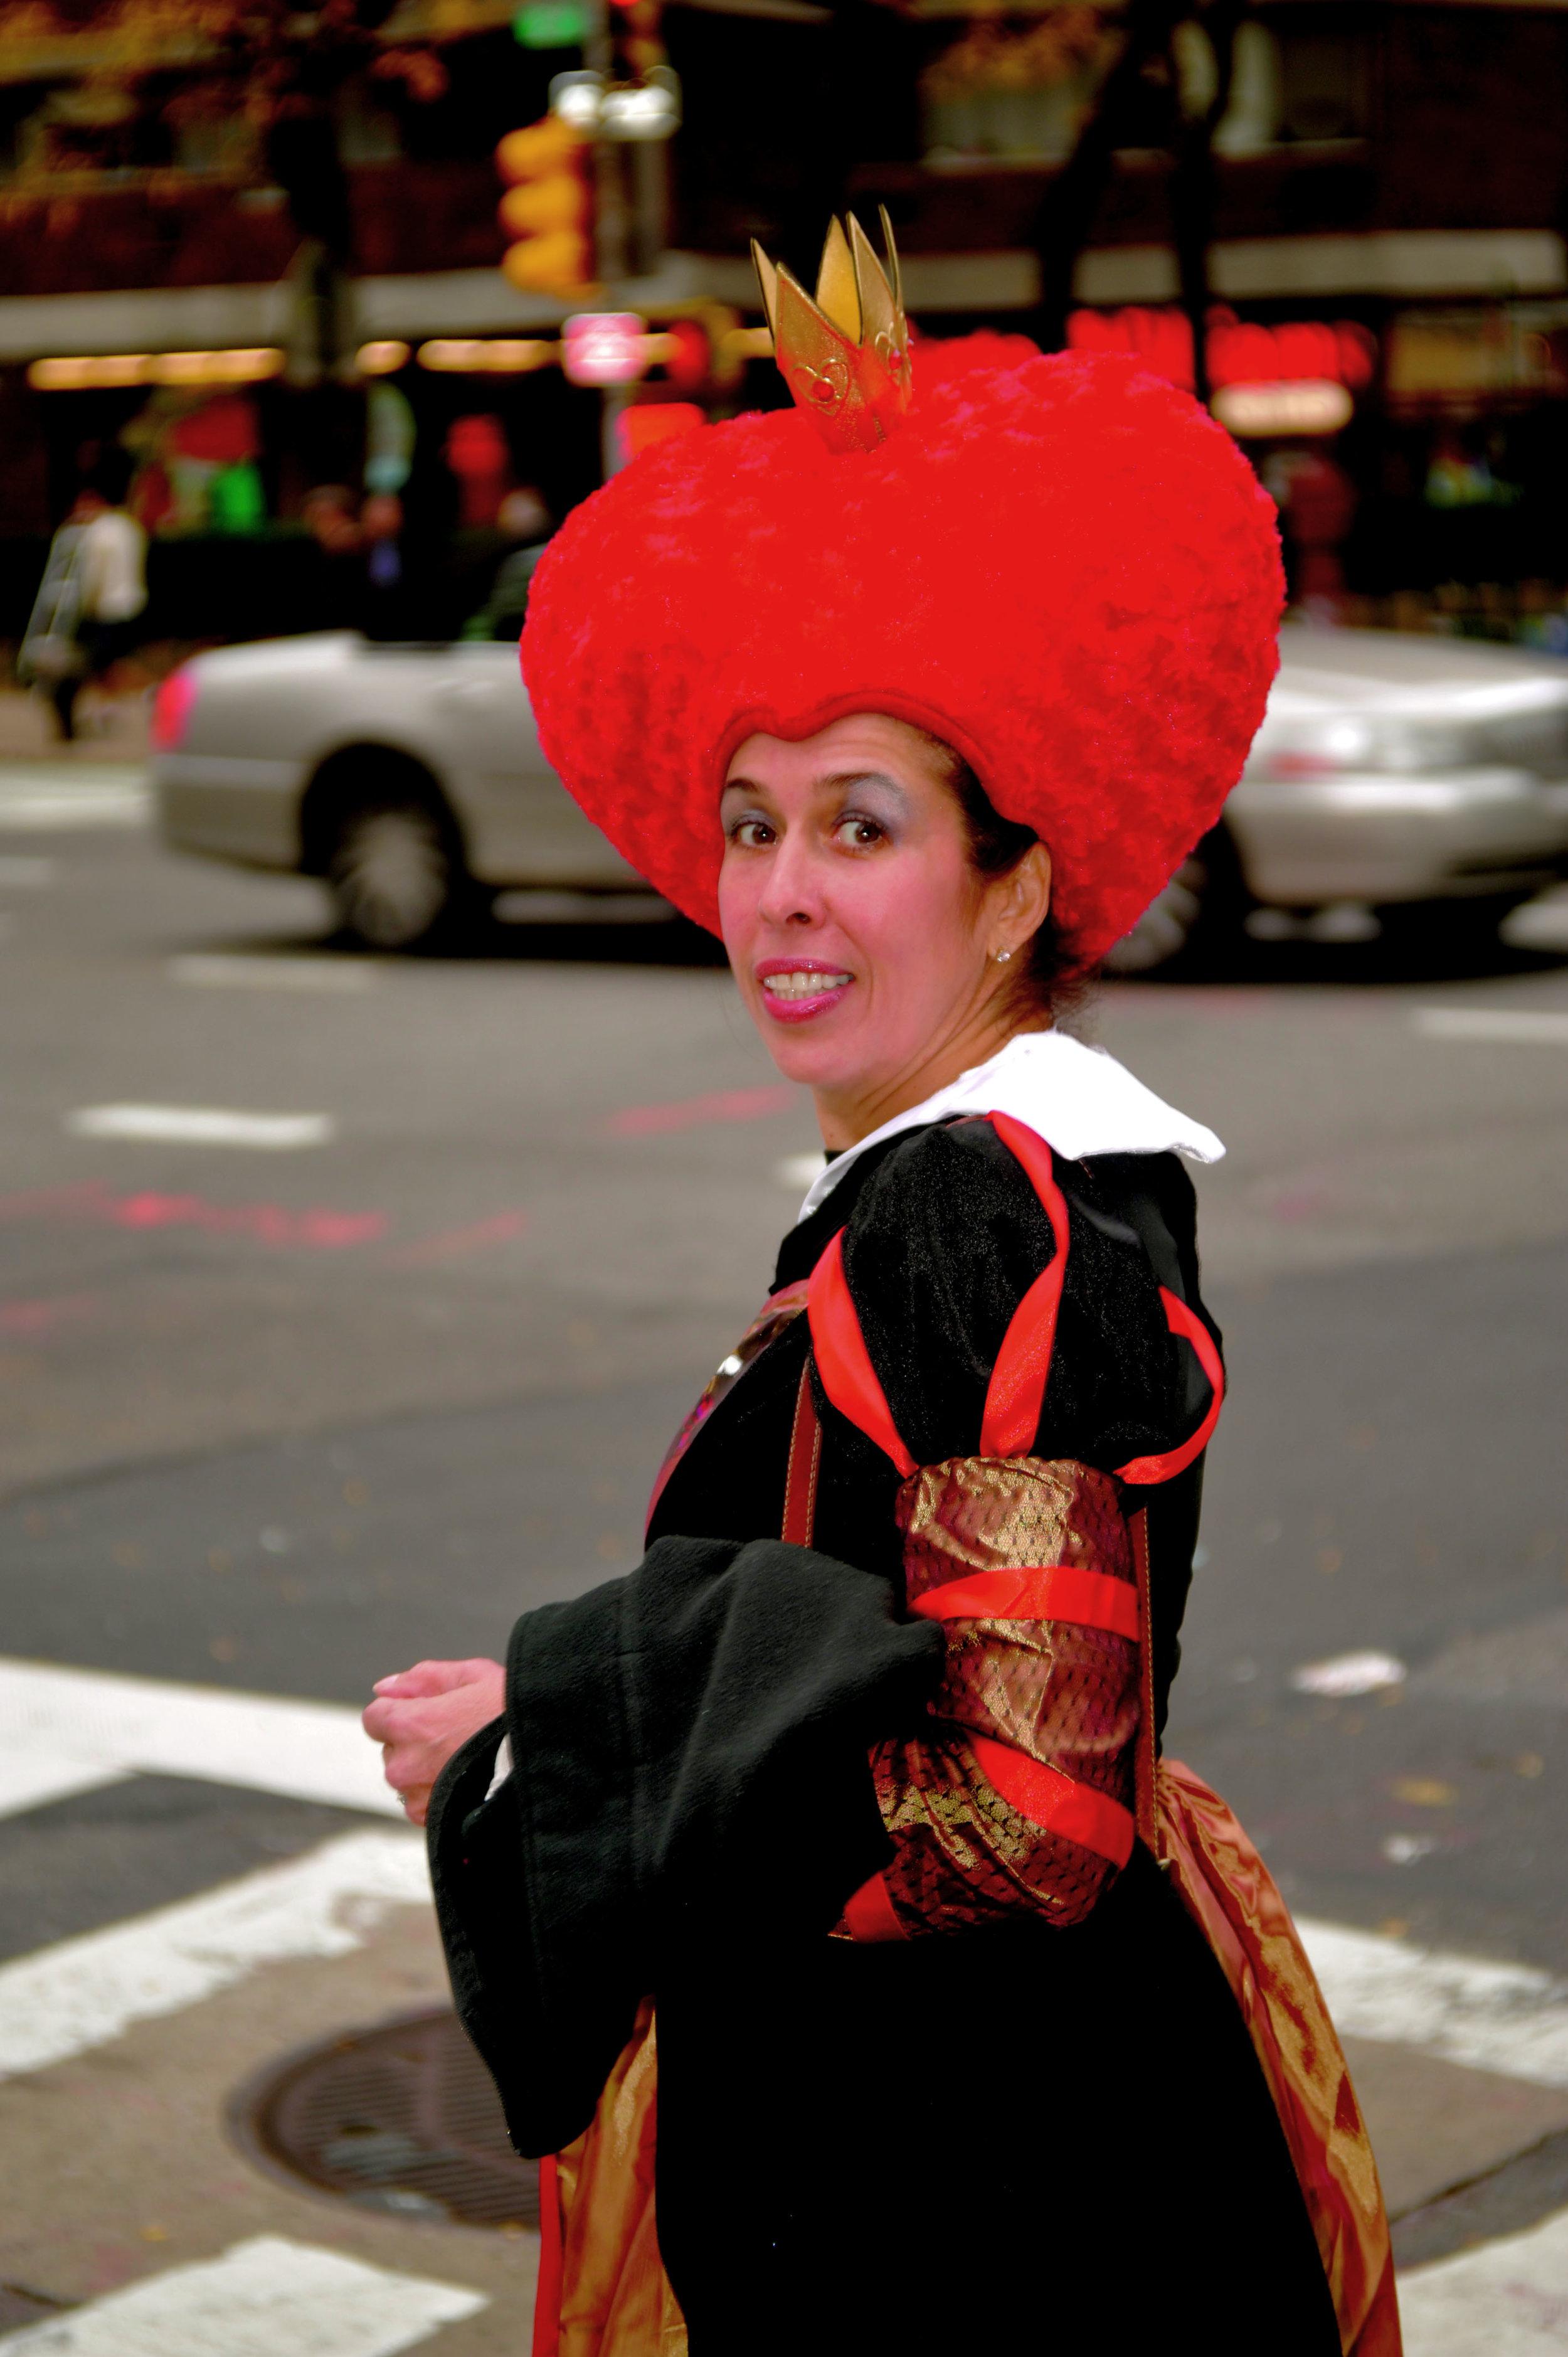 HALLOWEEN strawberry hat.jpg